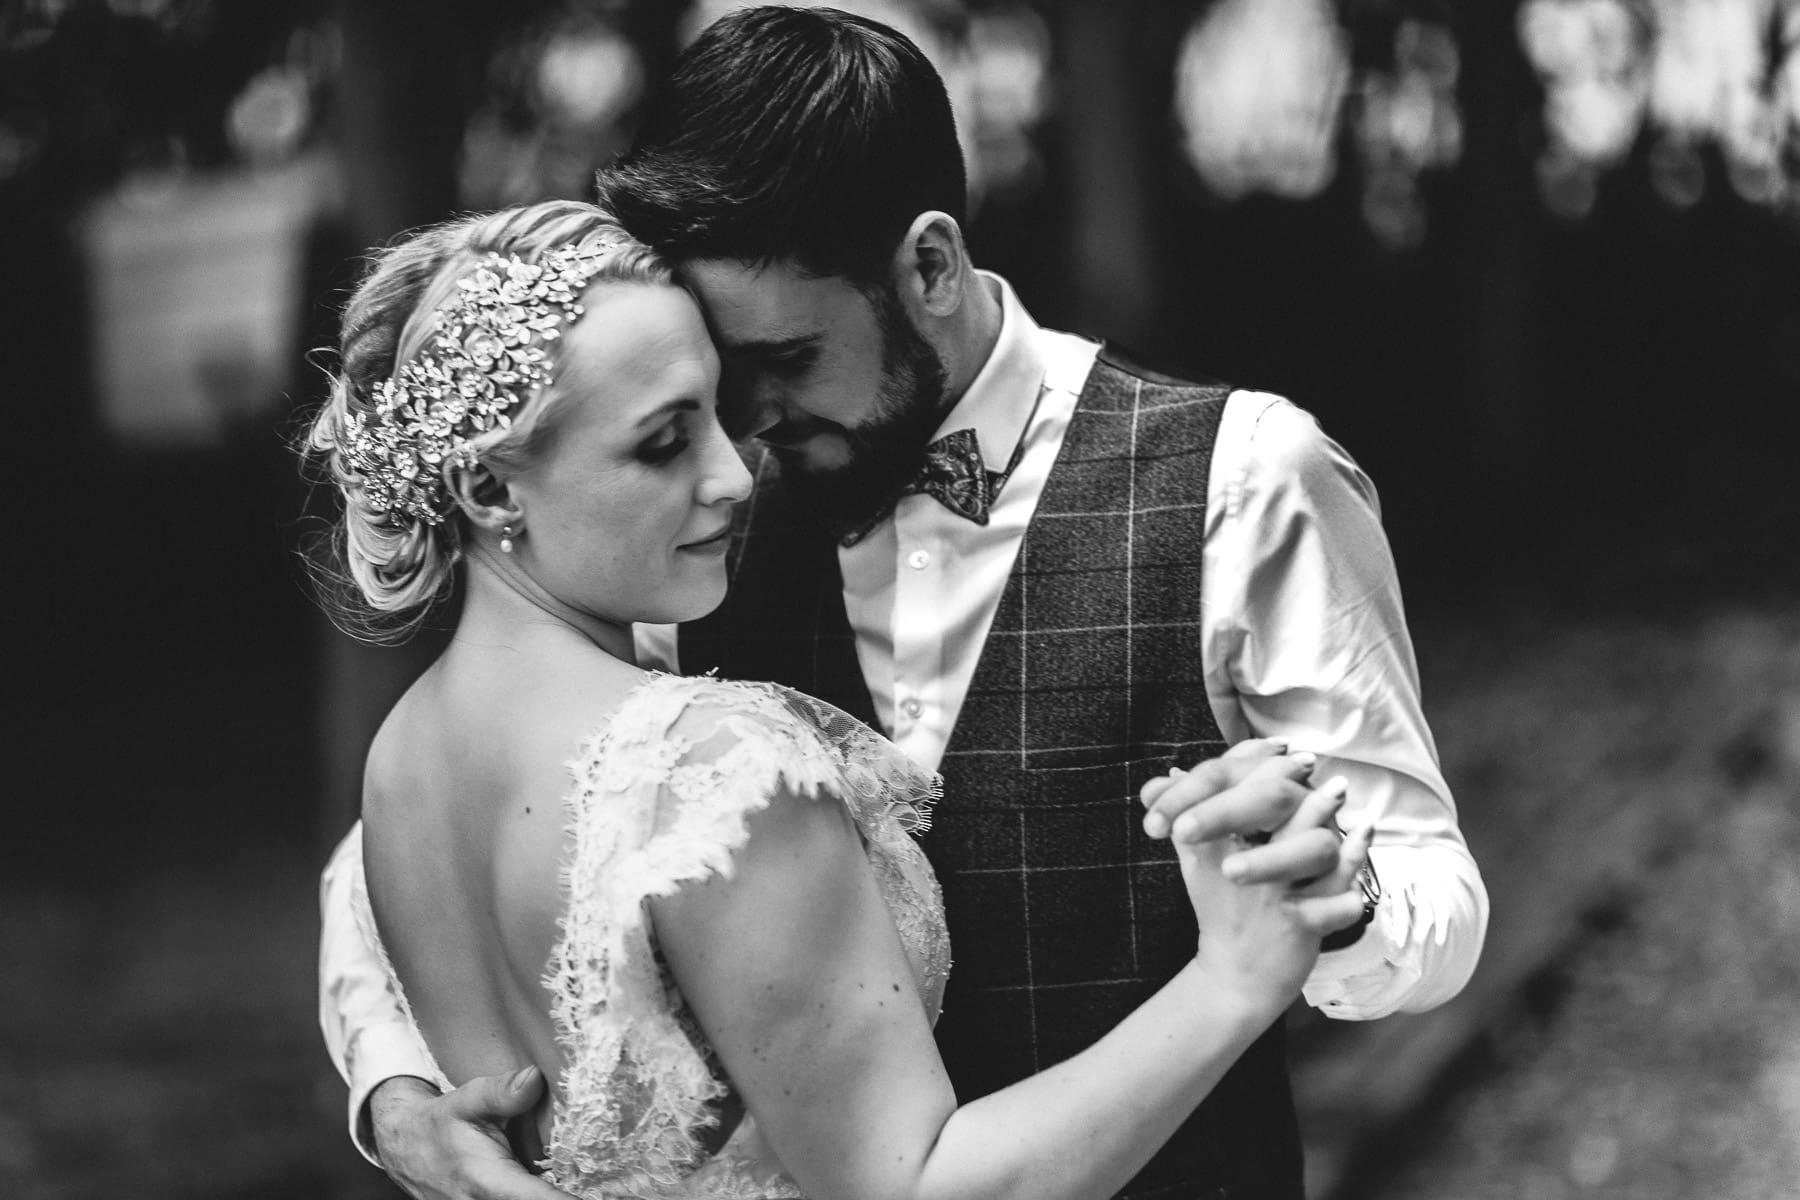 Wedding photography portrait of wedding couple dancing at sougthon hall